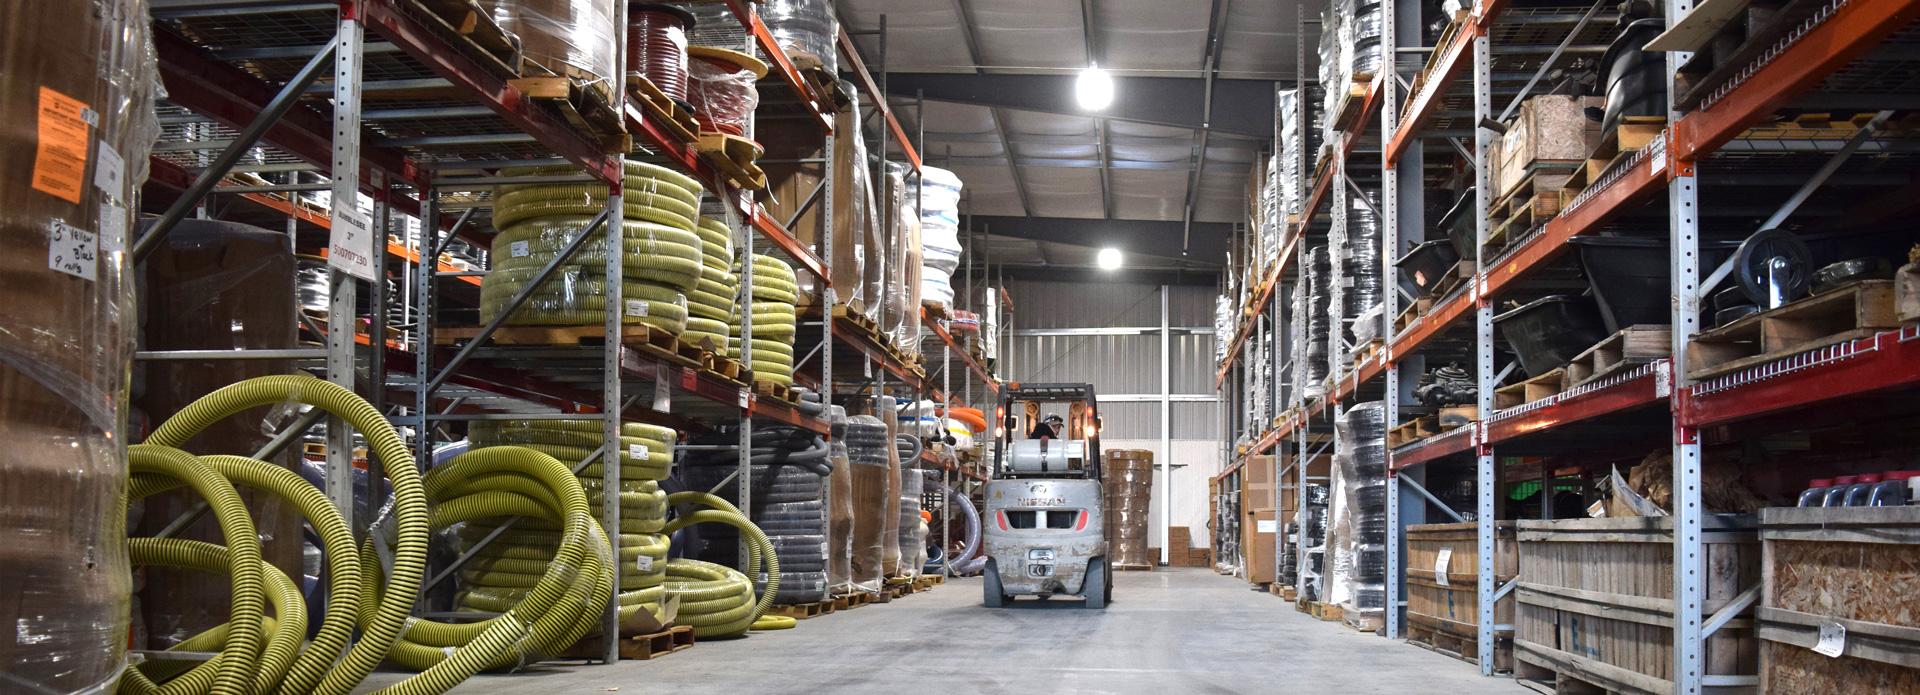 Eldon-C-Stutsman-Inc-Hose-Hose-Accesories-Valves-Warehousing-